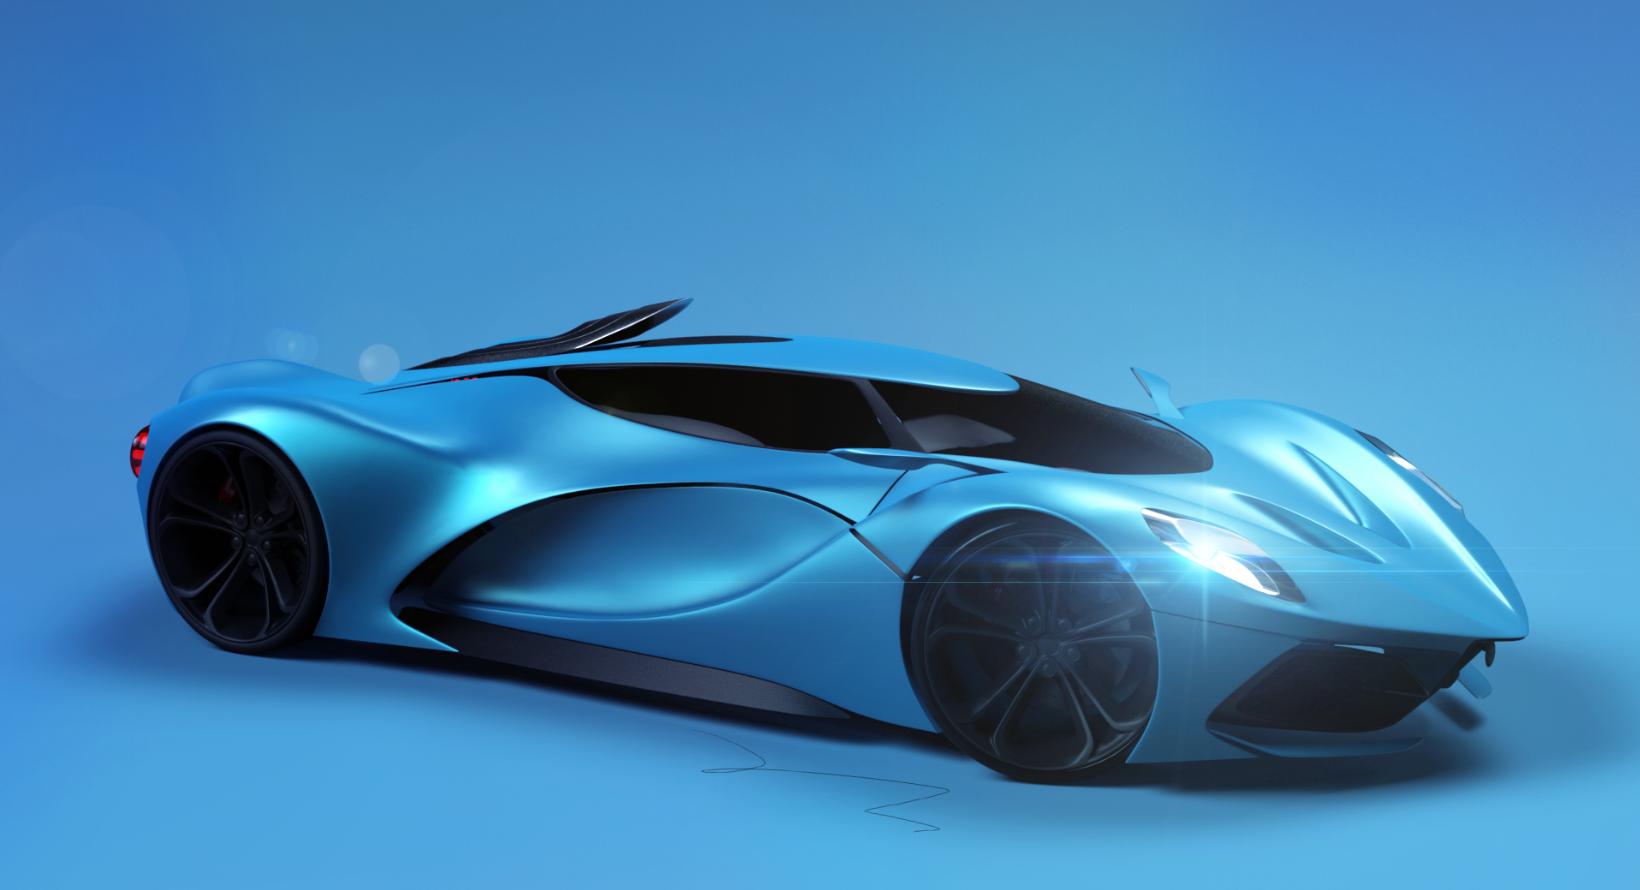 How To Pronounce Koenigsegg >> Aston Martin Valkyrie concept finally revealed